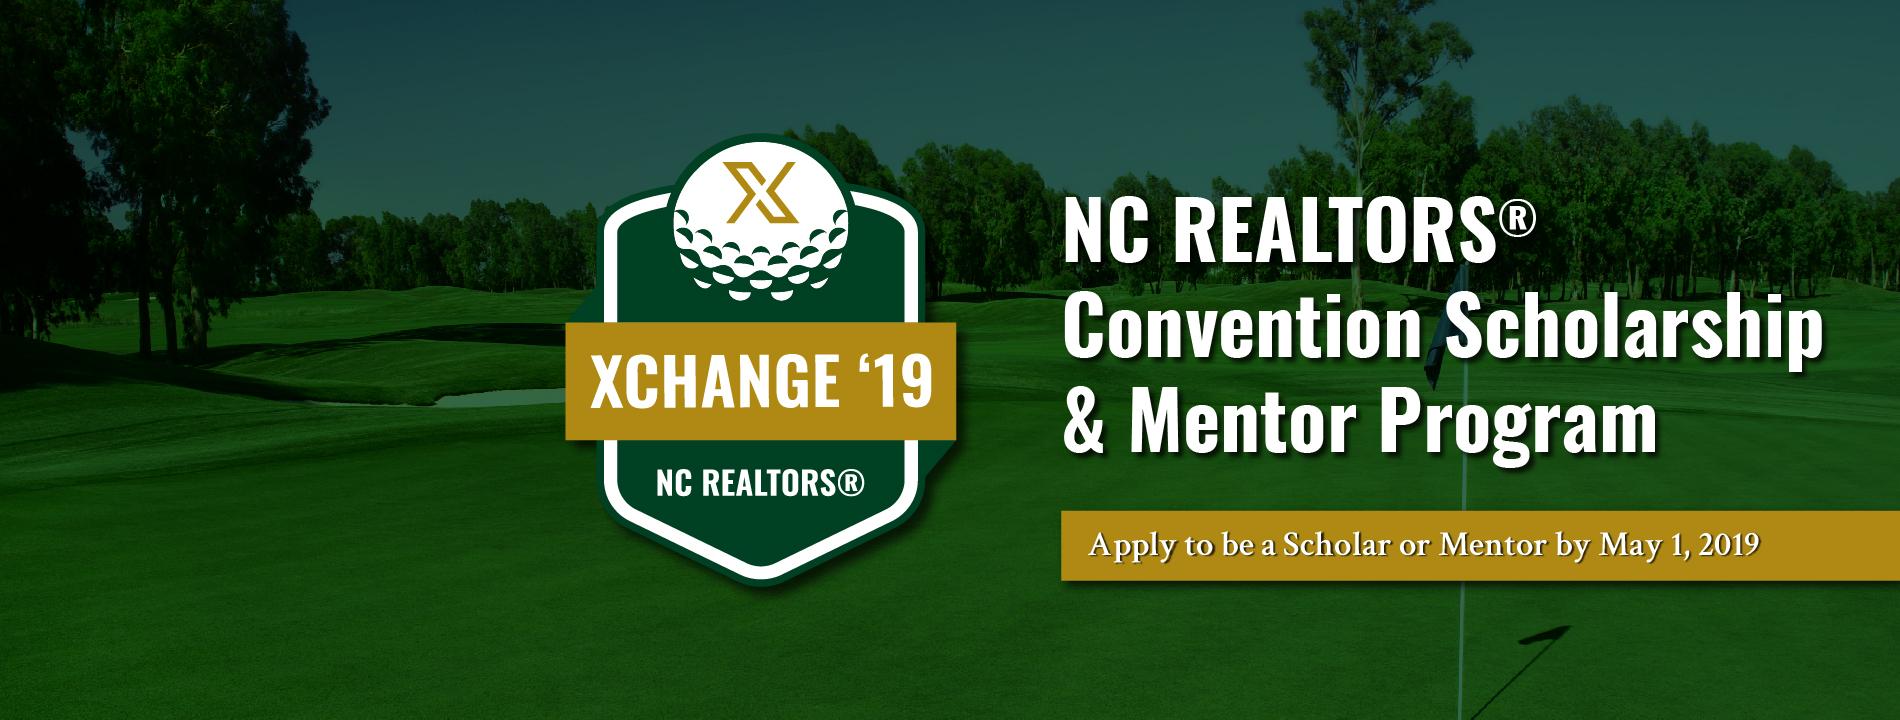 NC REALTORS® Convention Scholarship and Mentor Program. Apply by May 1, 2019 at ncrealtors.org/scholar-mentor.